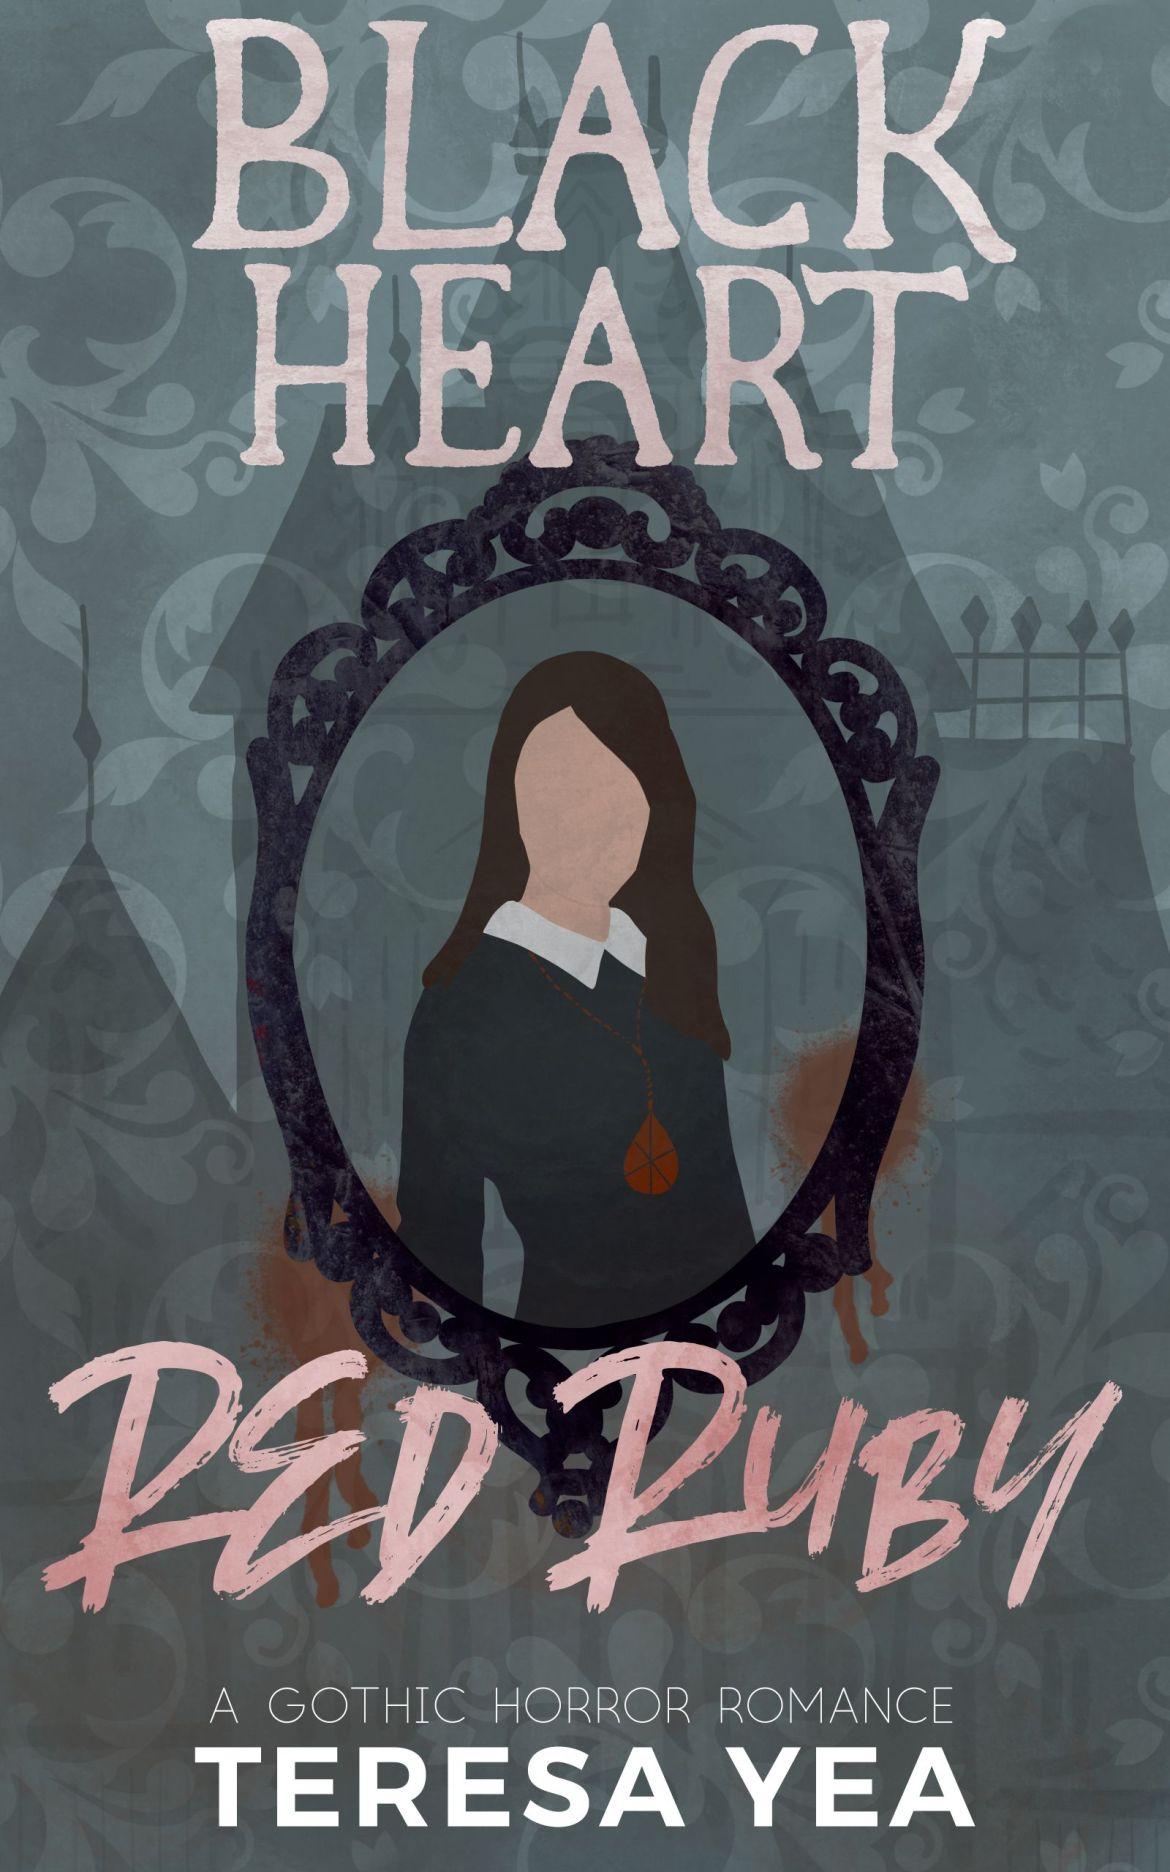 Black Heart, Red Ruby. Gothic Horror Romance